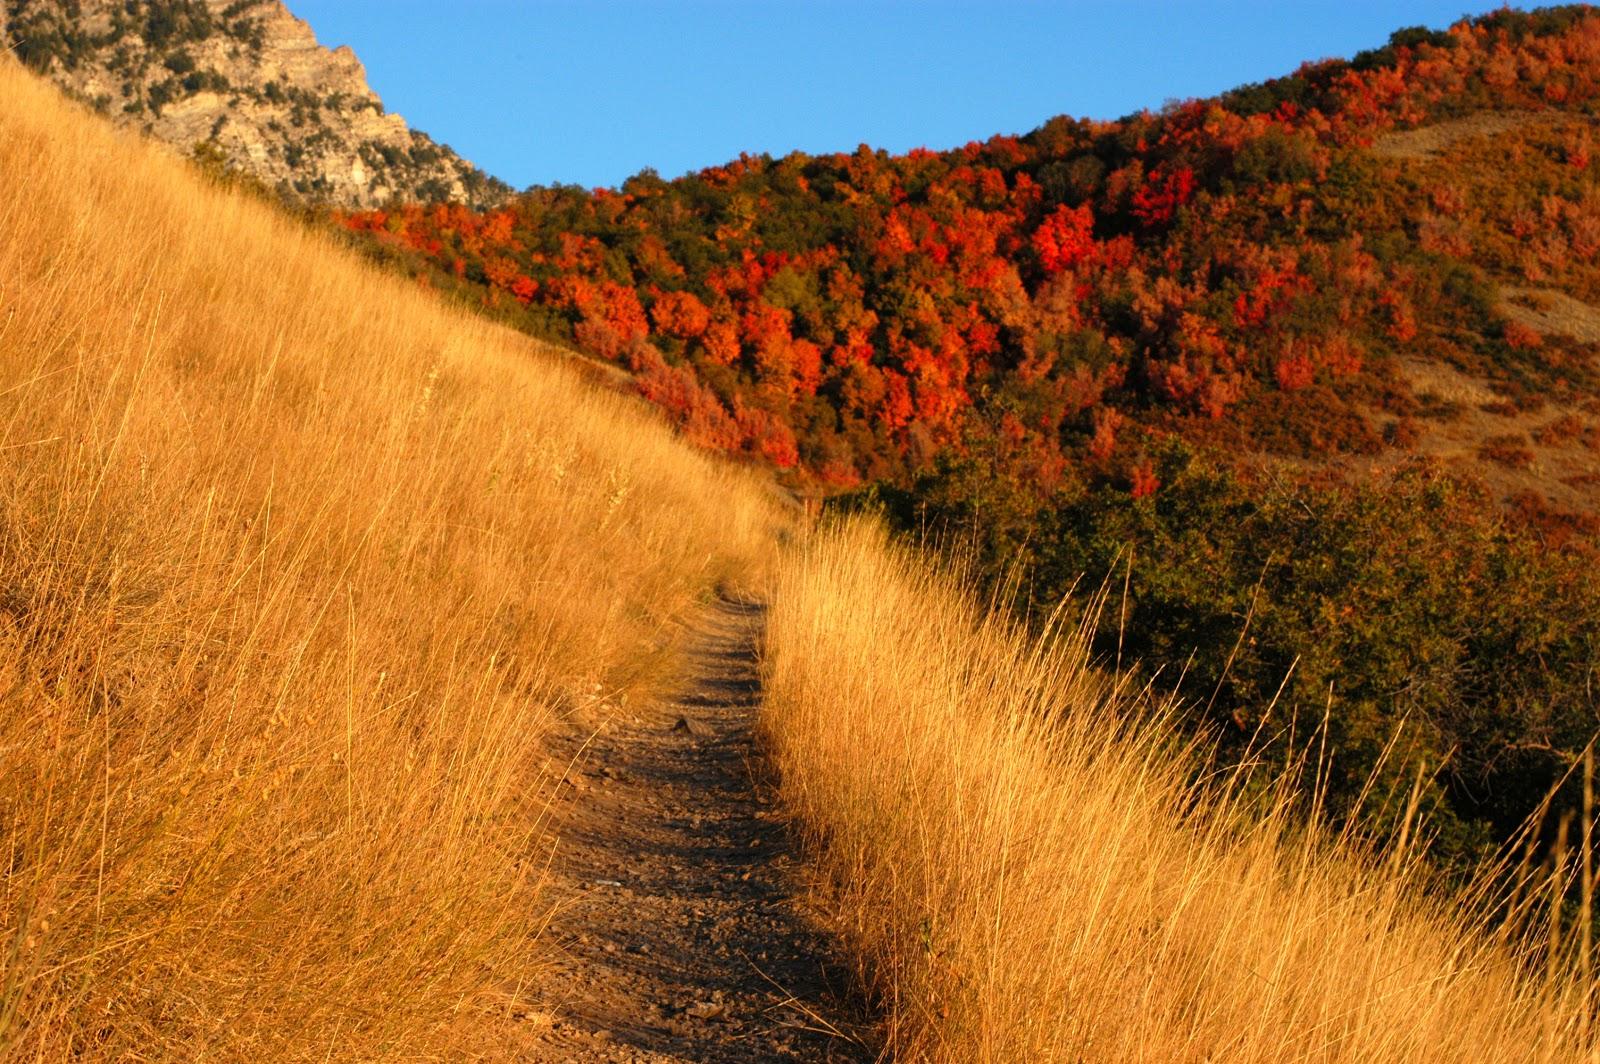 http://2.bp.blogspot.com/-uPIfiSG2YUc/UIk-a0mj6xI/AAAAAAAABLA/7t_cm-Dh2sI/s1600/Autumn_mountain_trail.jpg